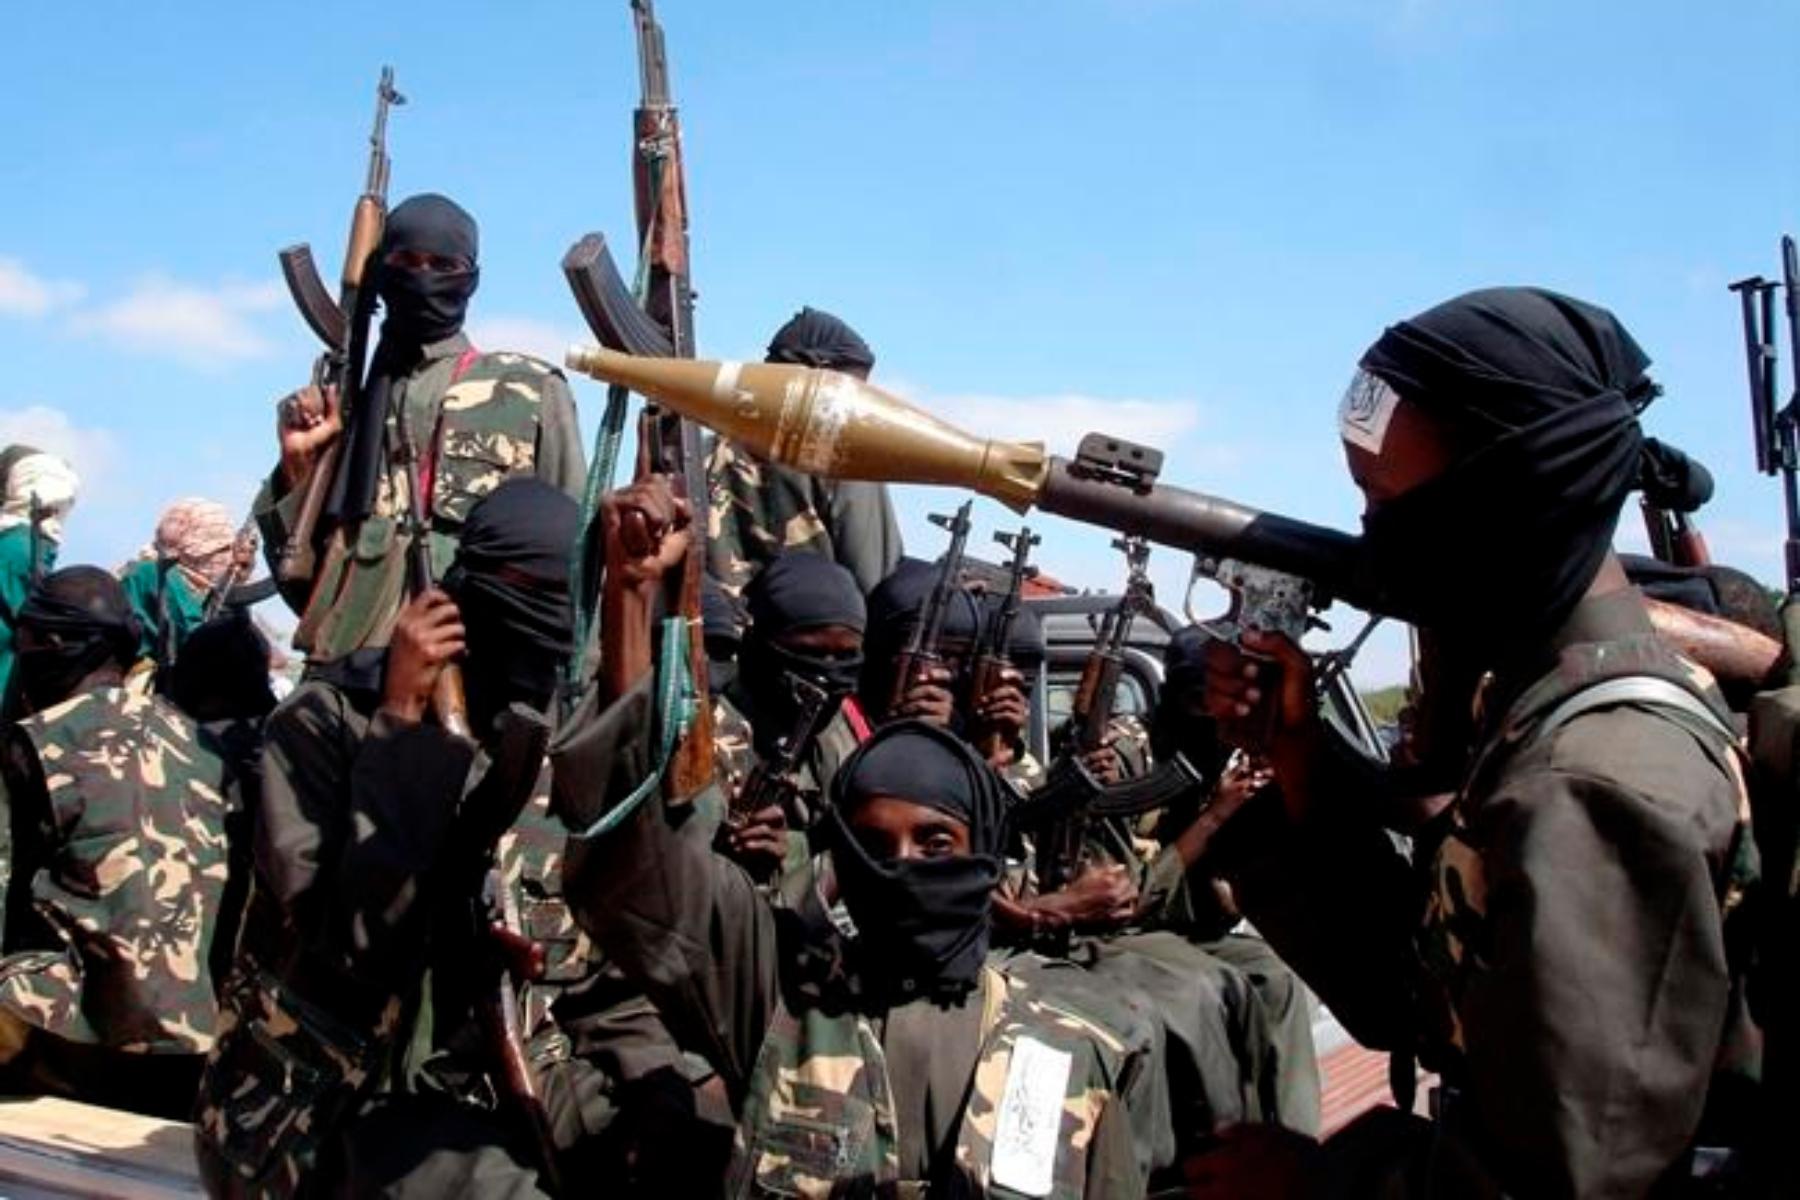 US Kills Two al-Shabaab Terrorists in Airstrike Following Deadly Kenya Attack